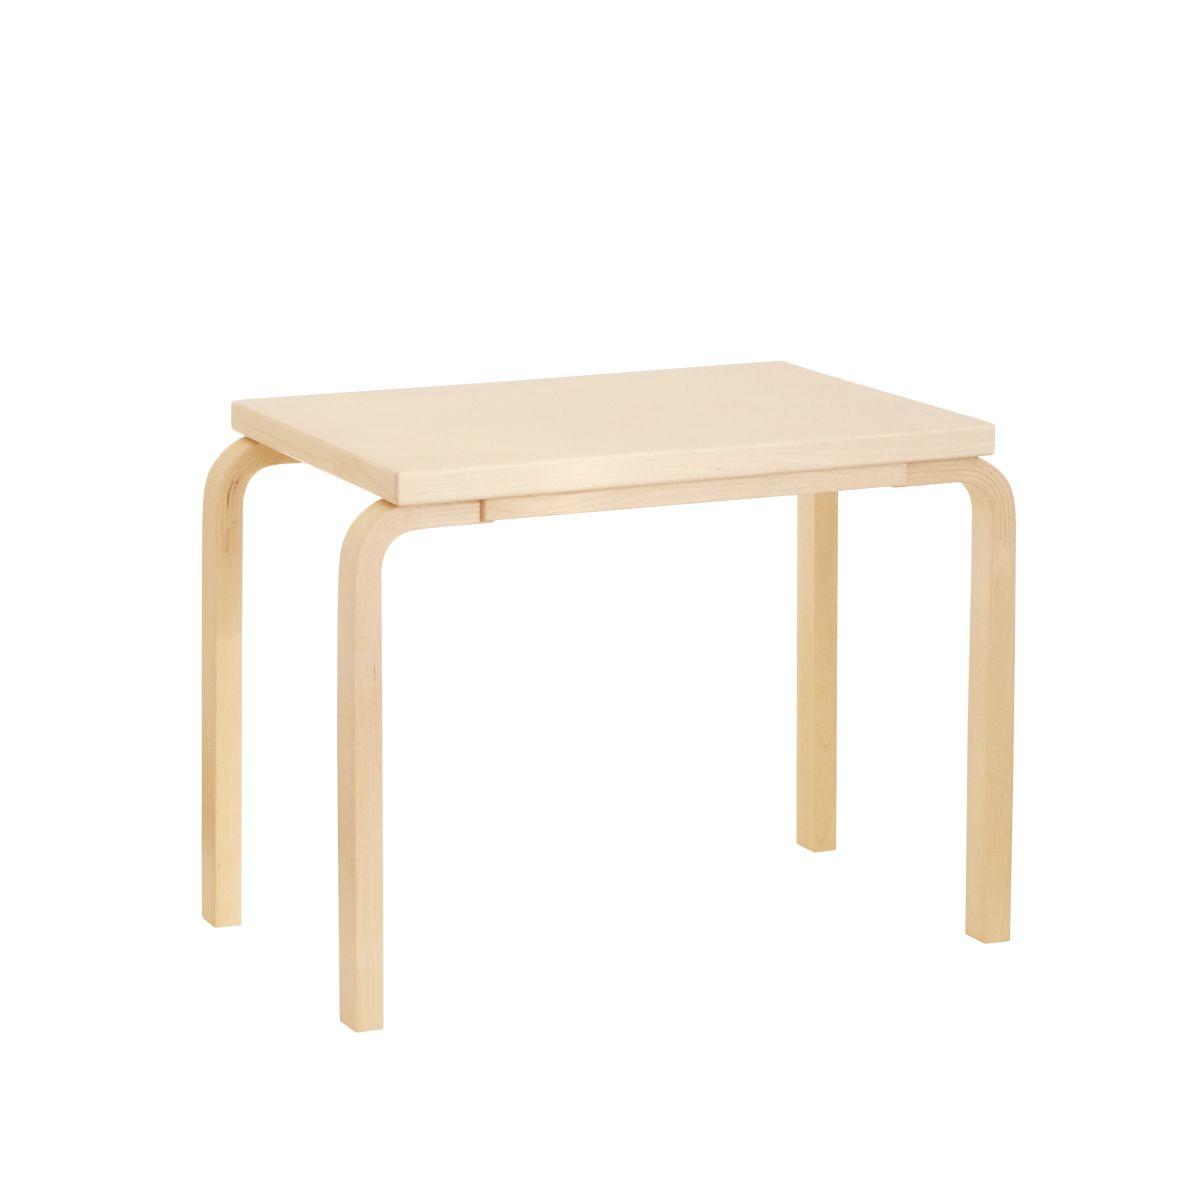 Nesting-table-88B-2995776